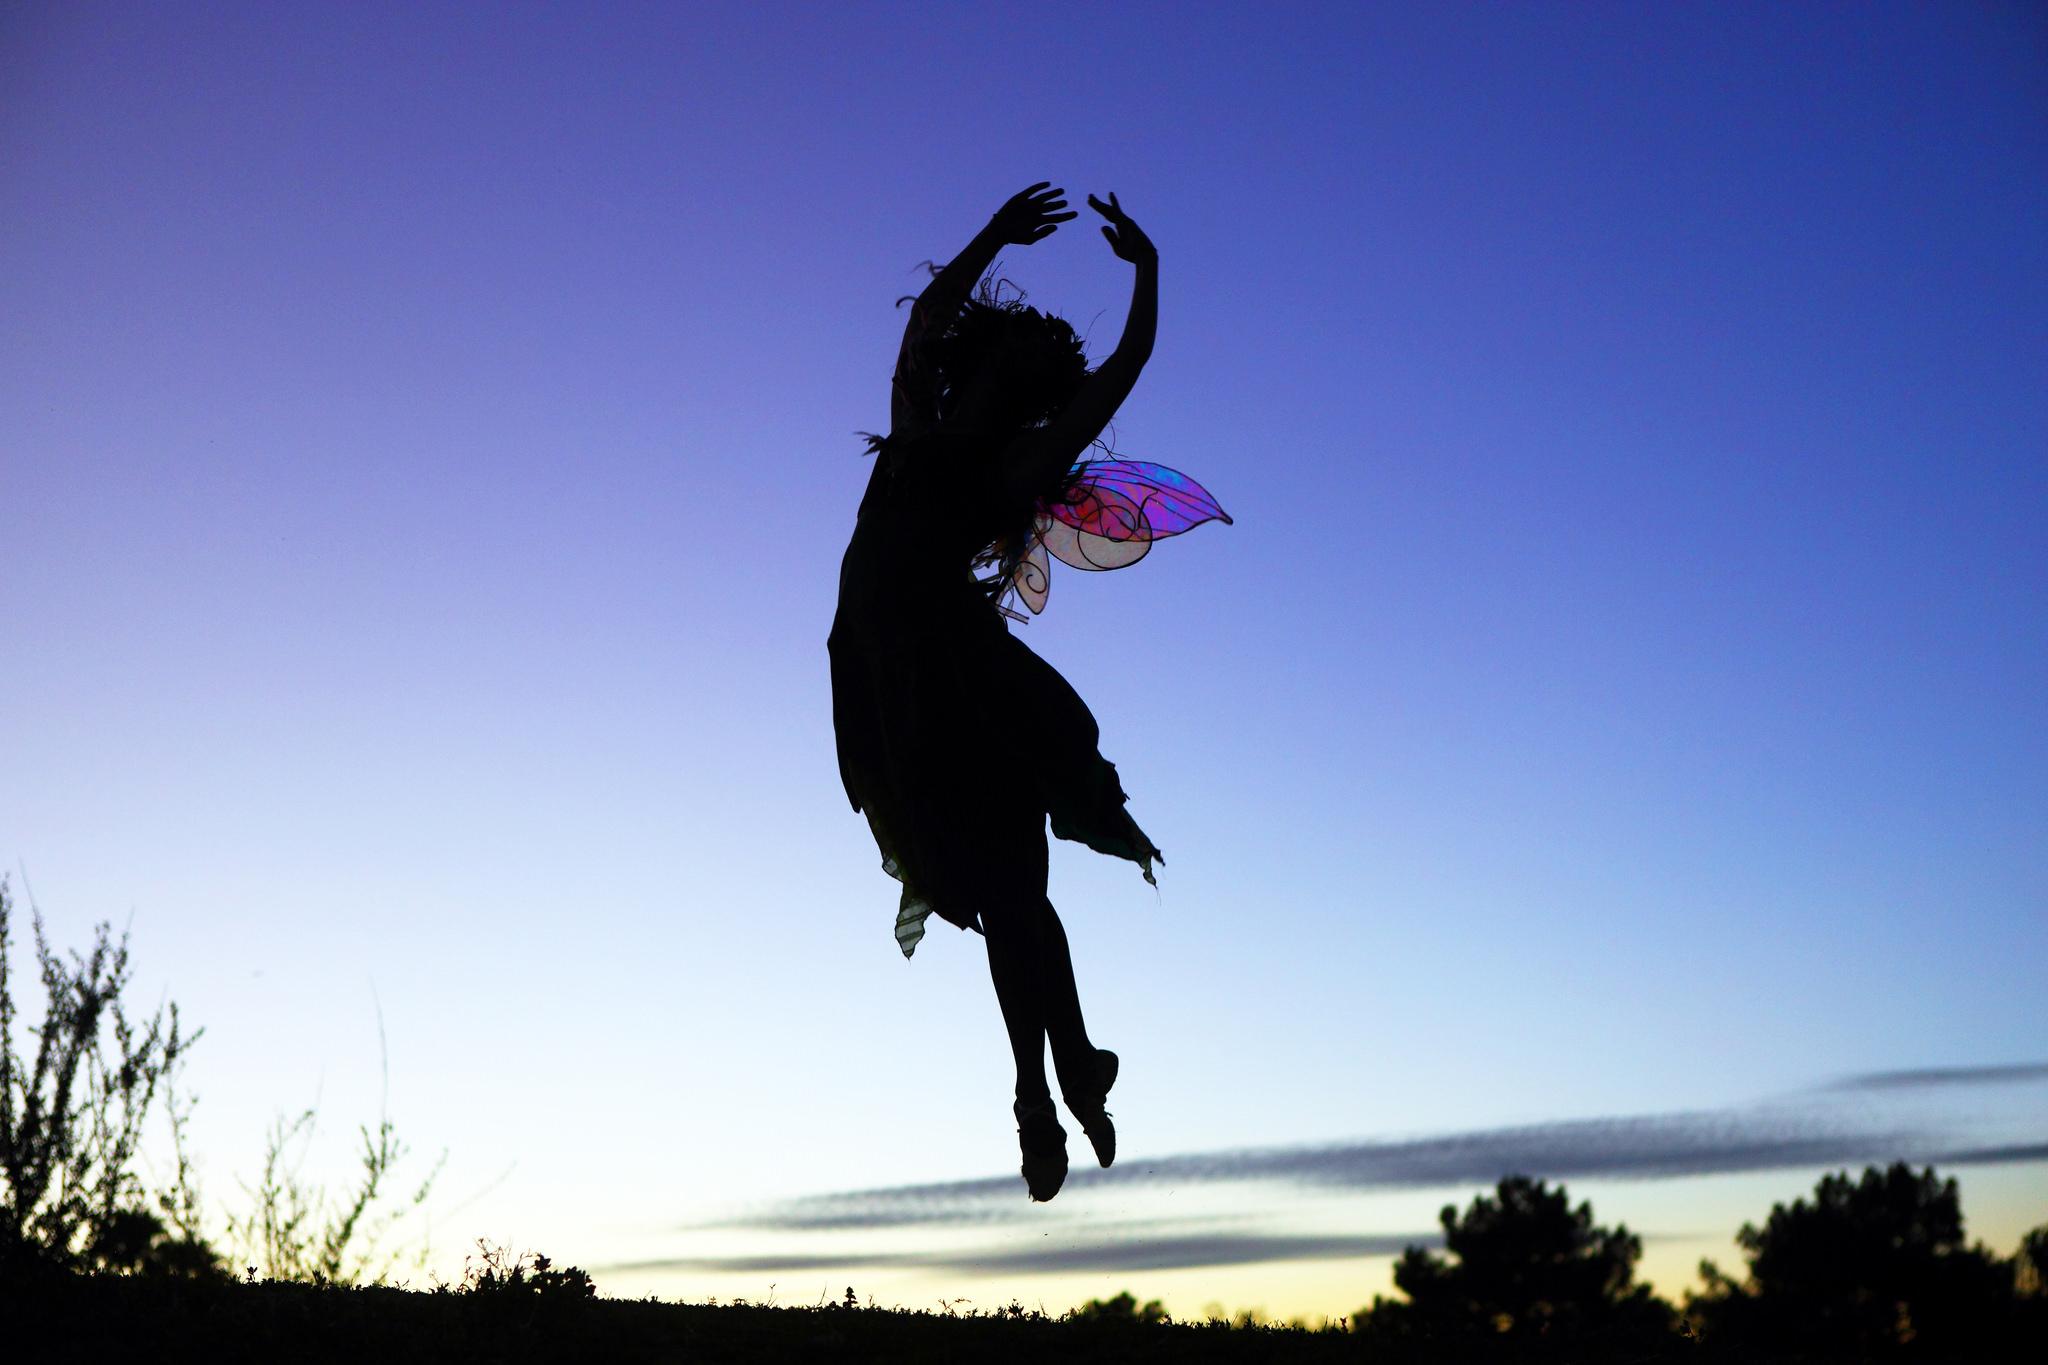 La silueta de una chica saltando - 2048x1365